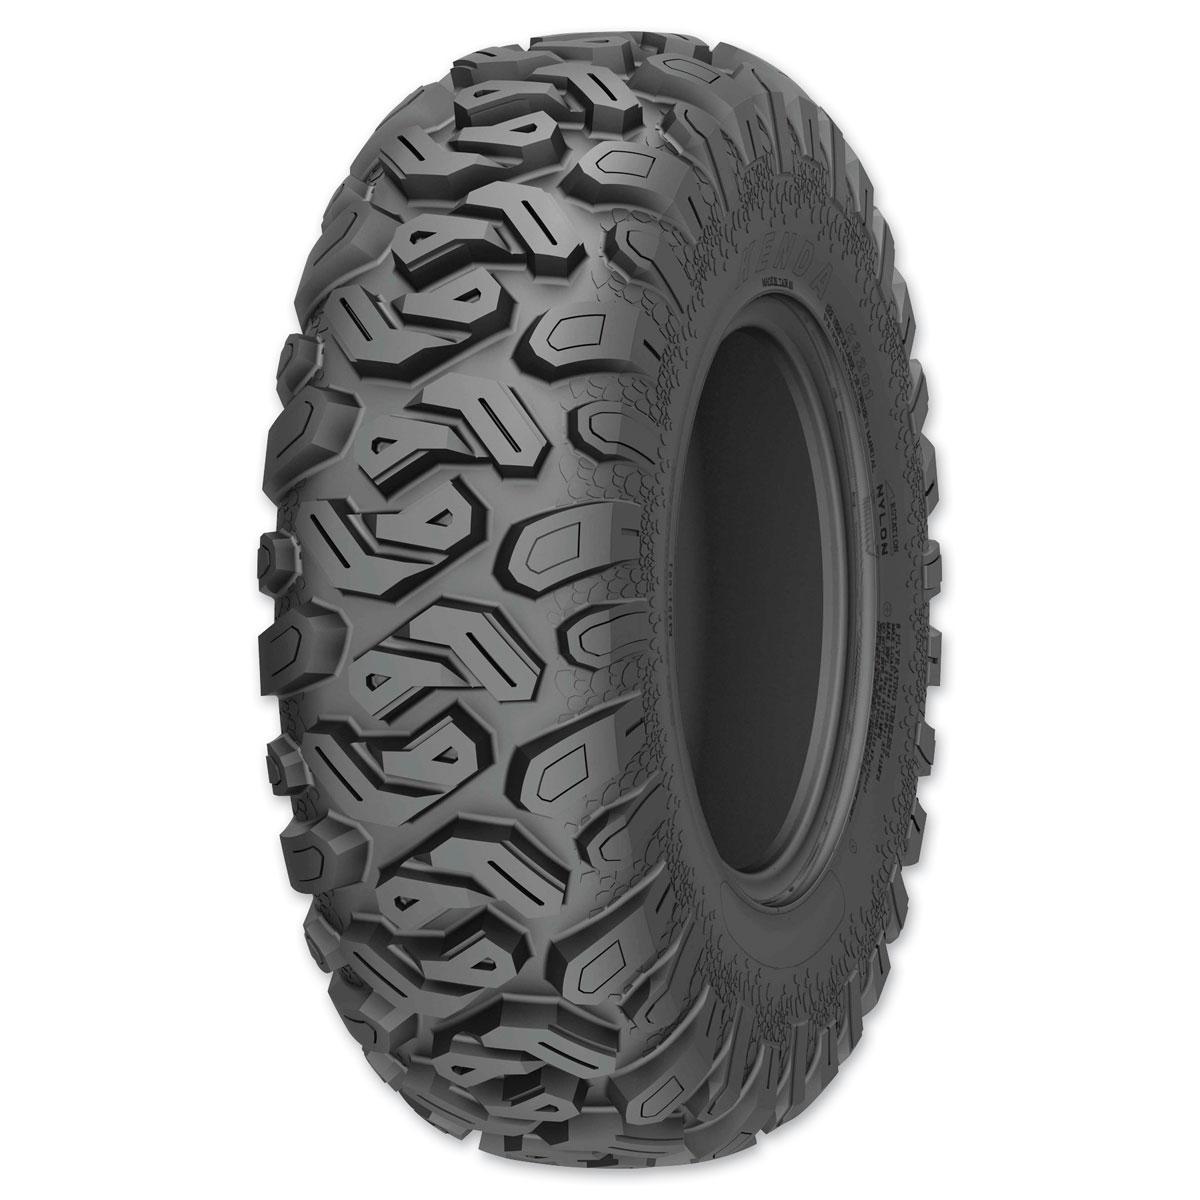 Kenda Tires Mastodon 26X11R-14 Front/Rear Tire